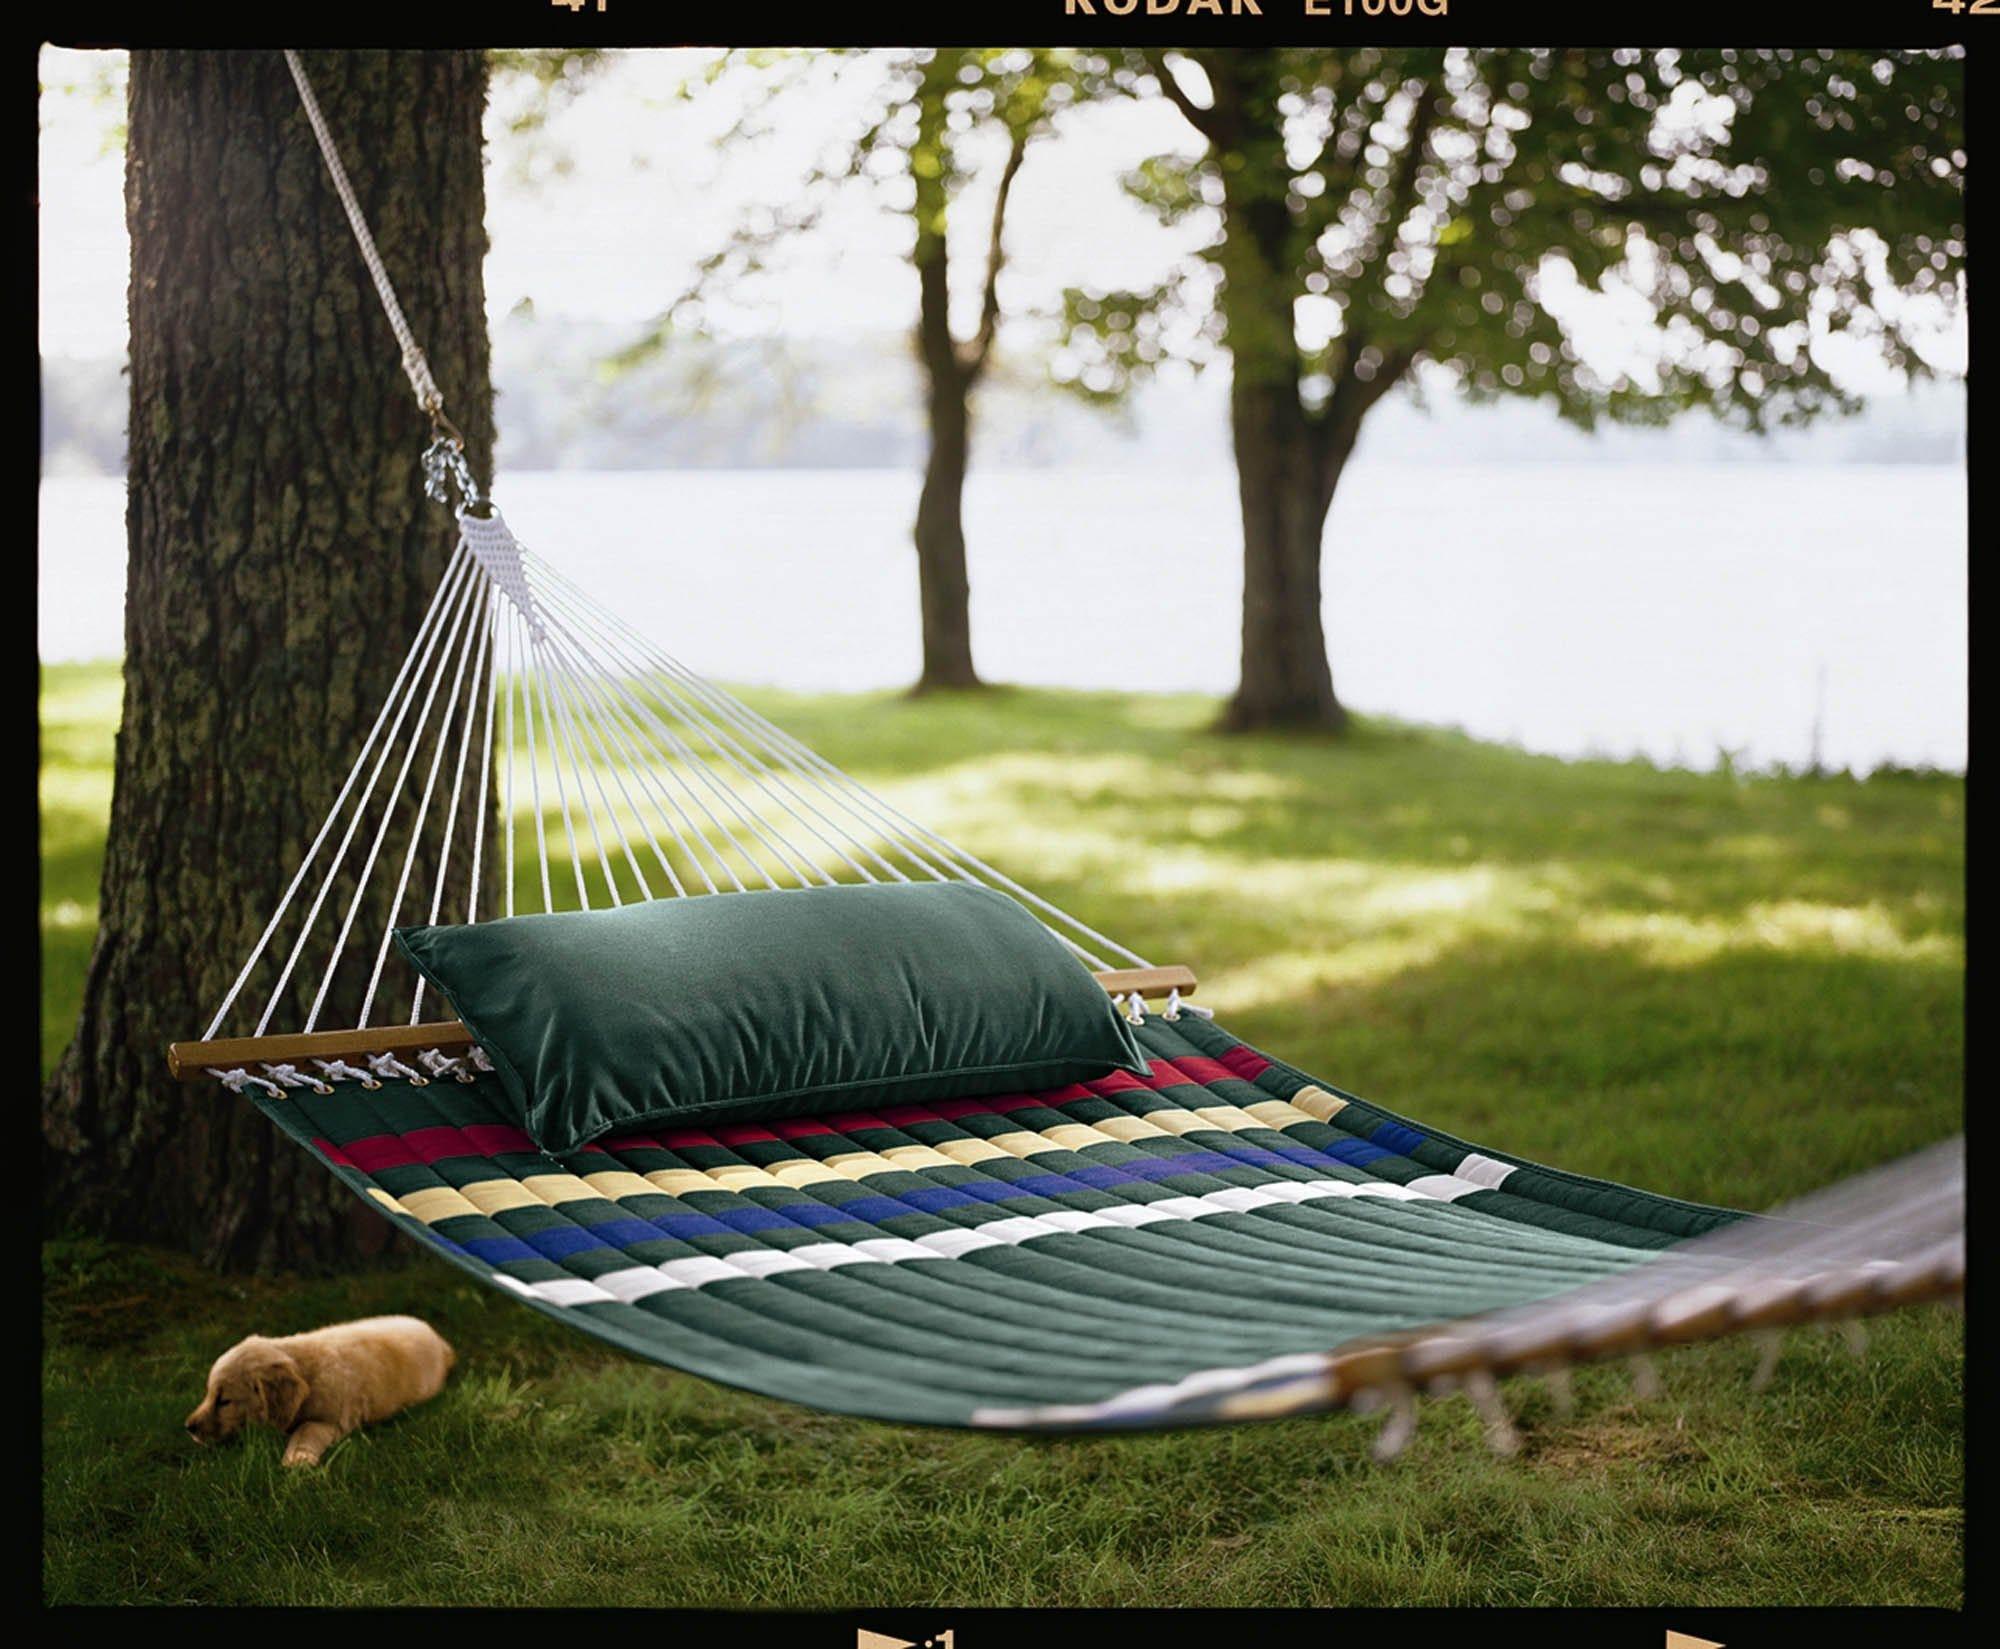 u p  school  quit hanging hammocks on trees or pay  25 fine  rh   freep